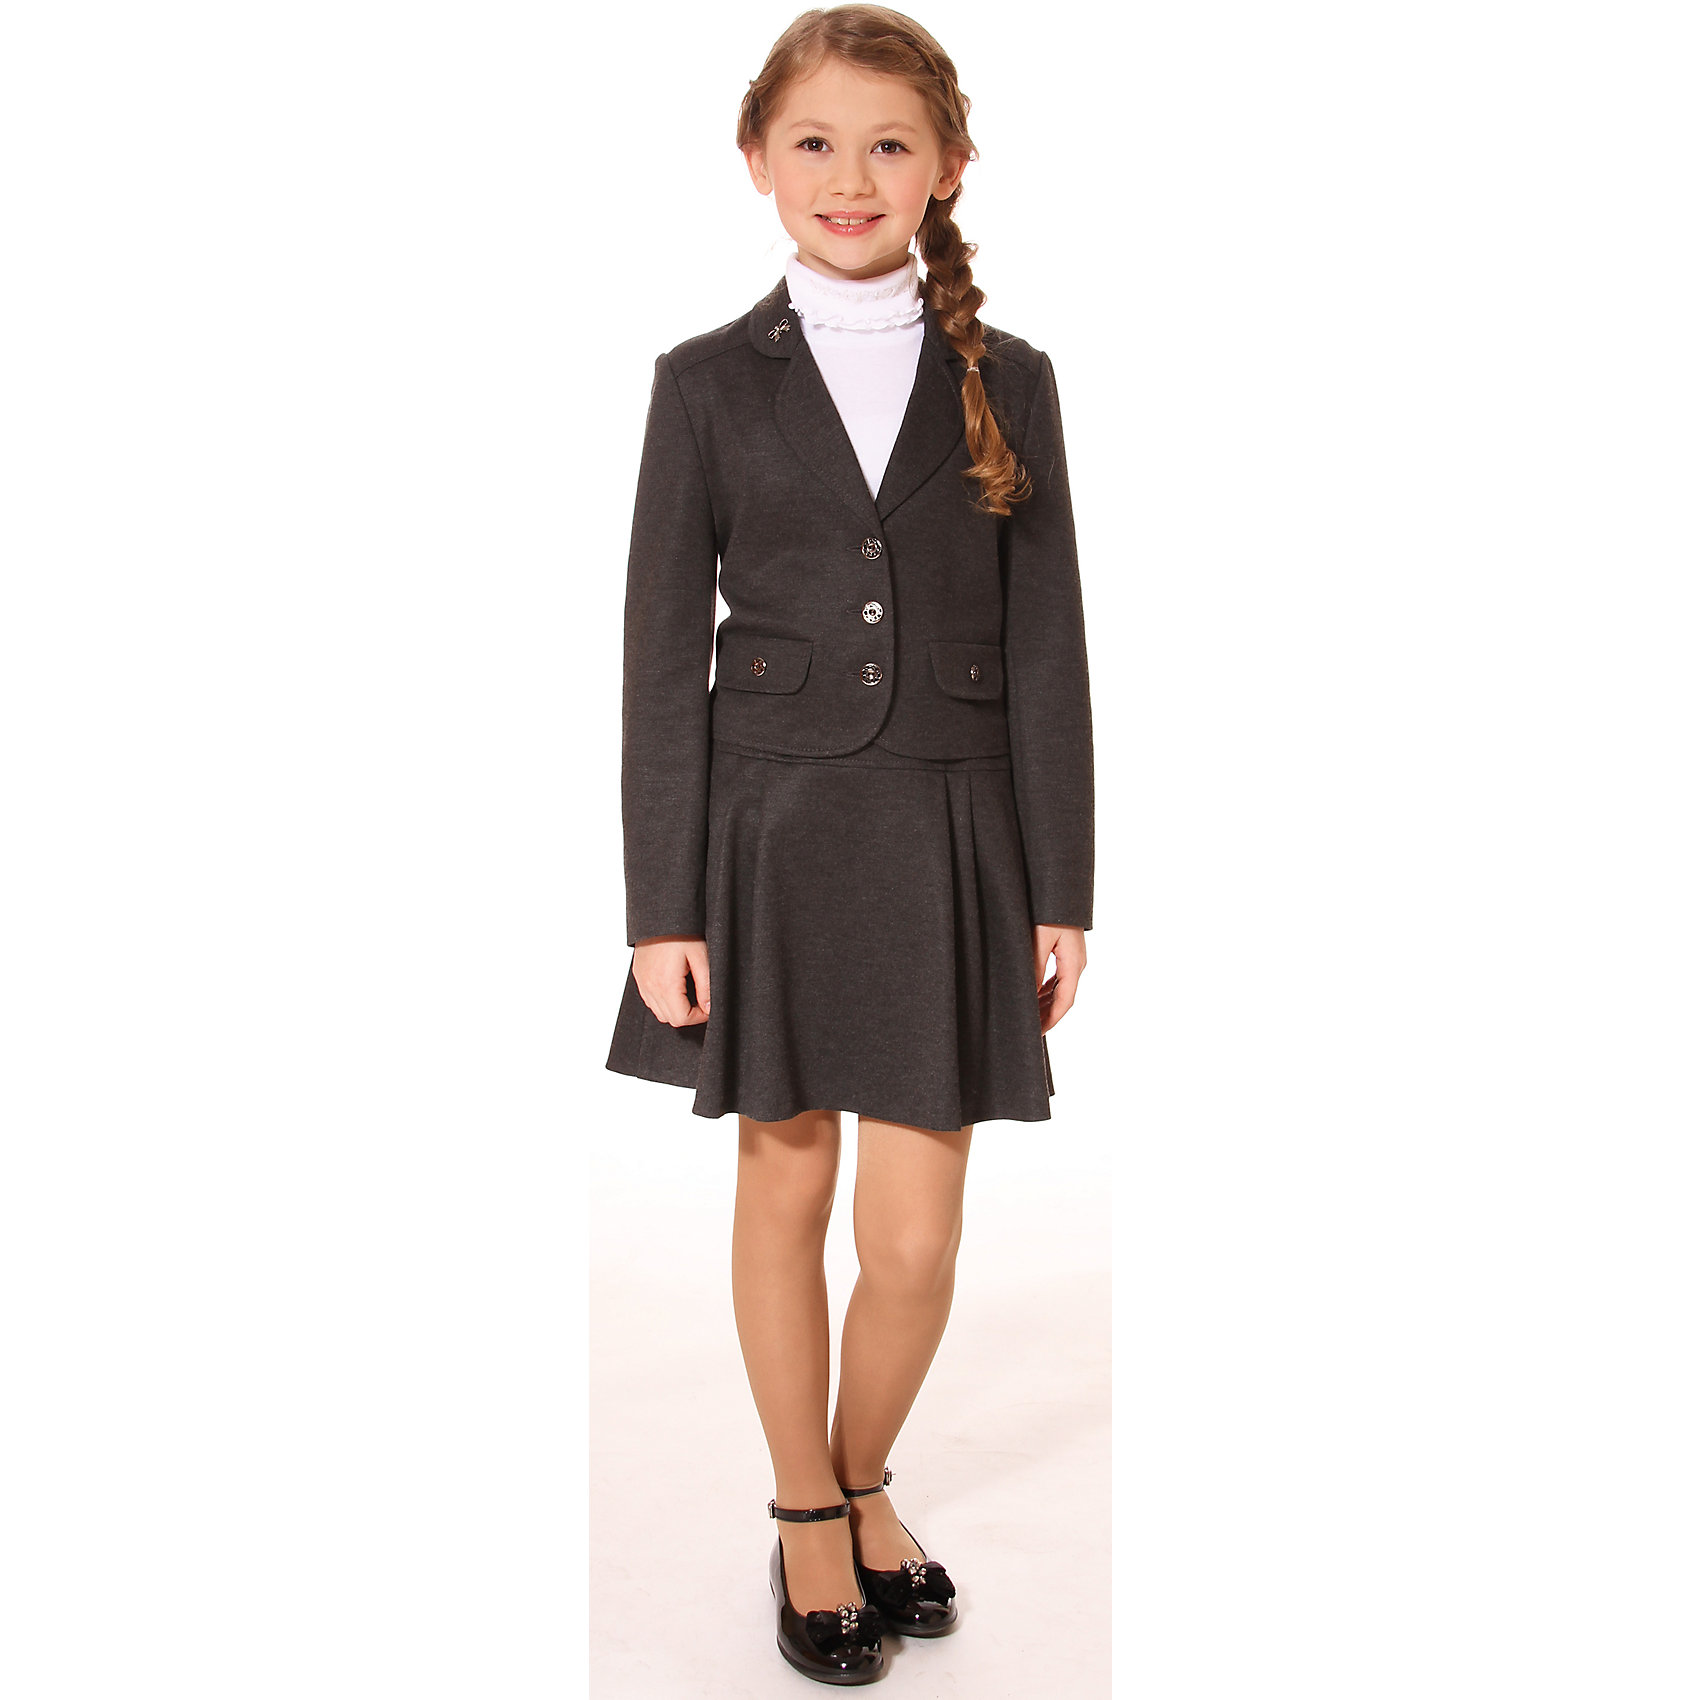 Смена Костюм для девочки: жакет и юбка для девочки Смена